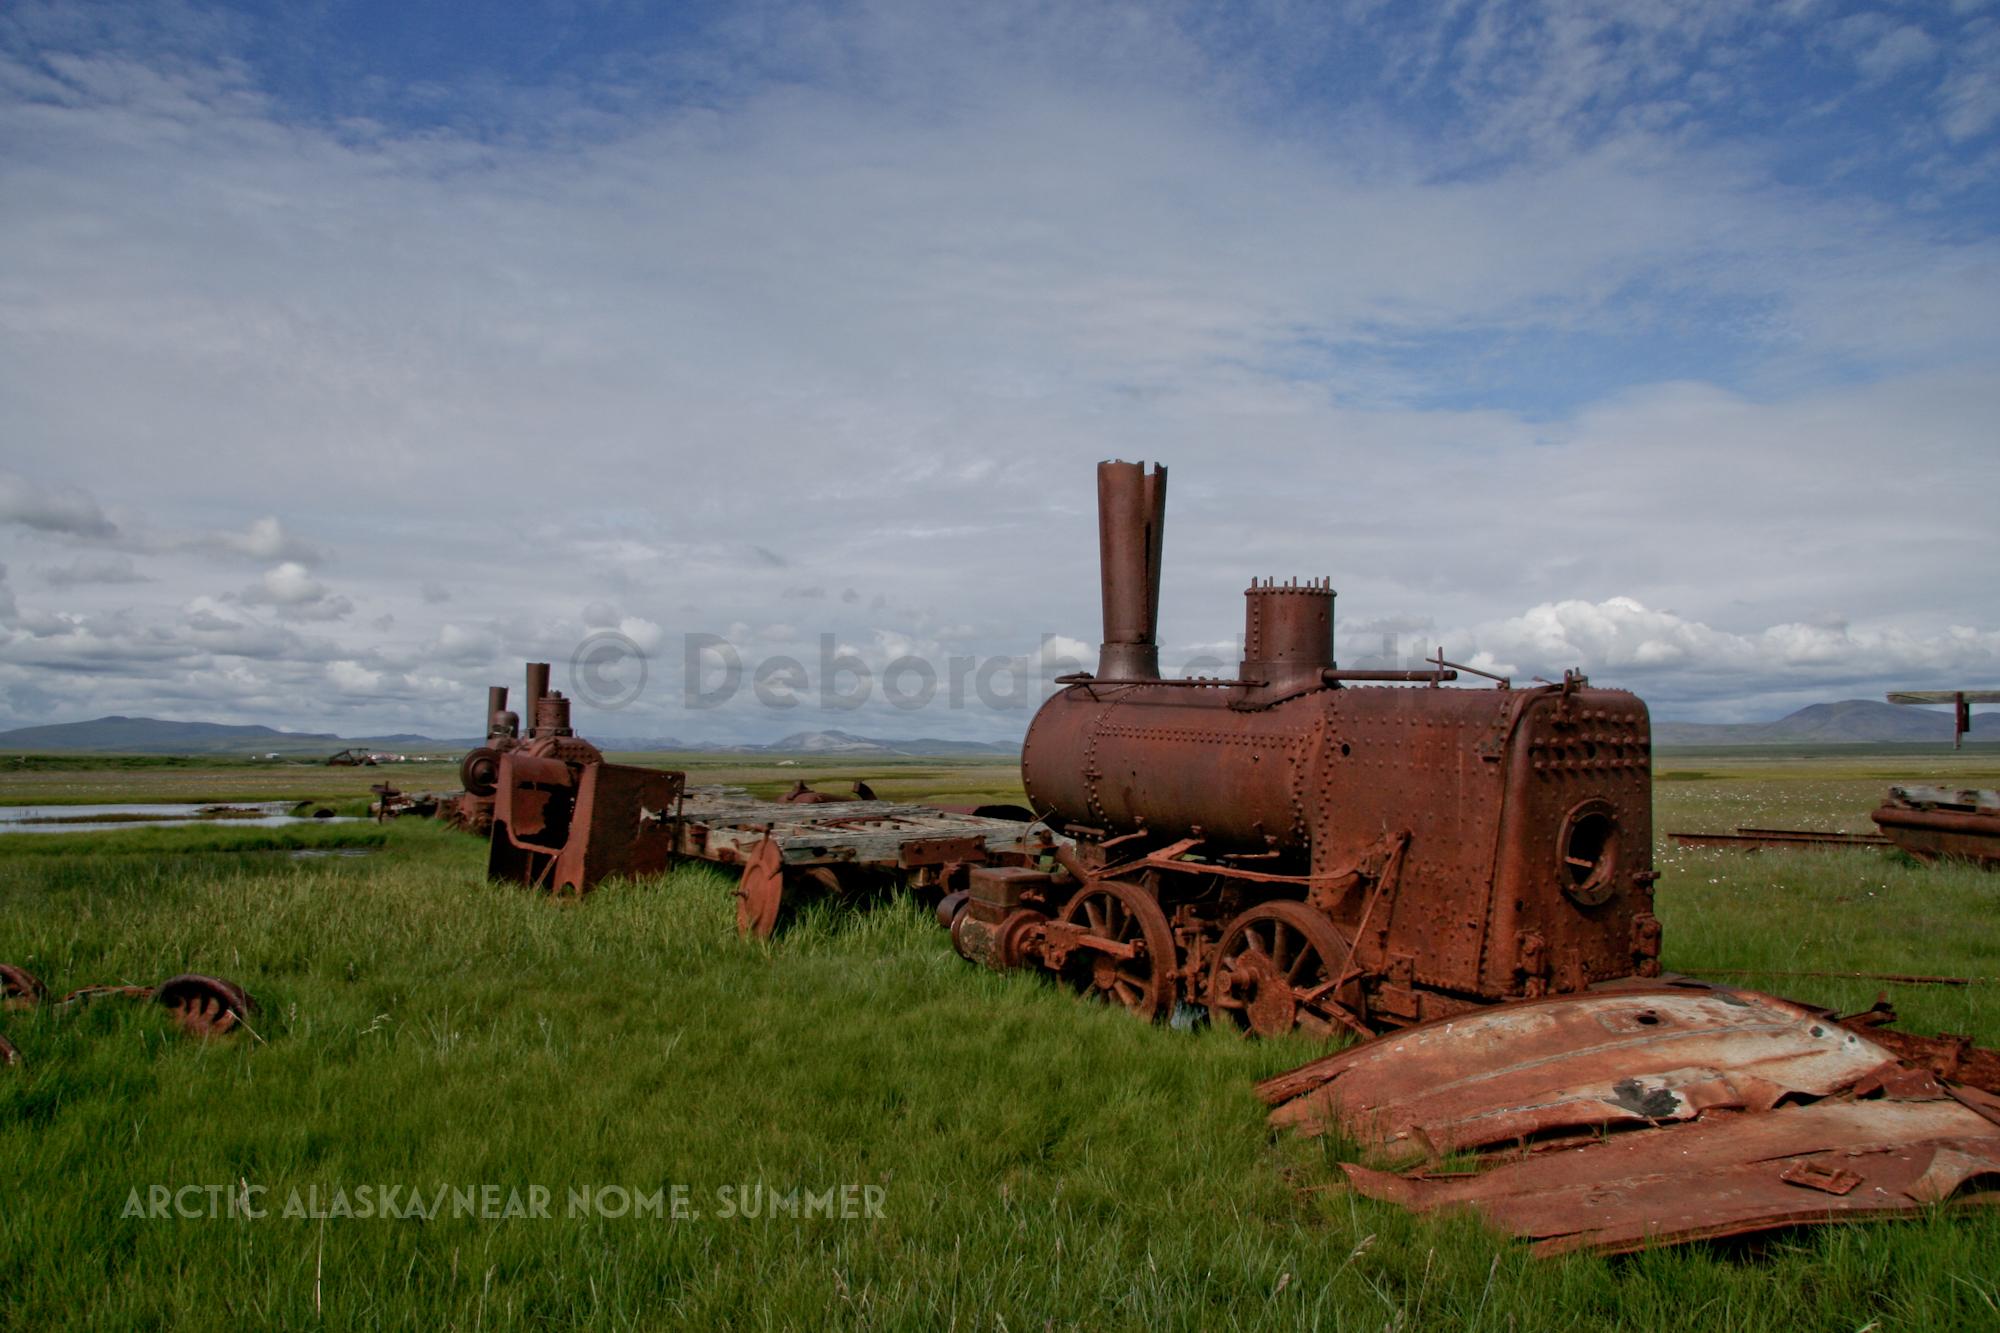 CT1. Arctic Alaska_ Train to Nowhere_ summer.jpg